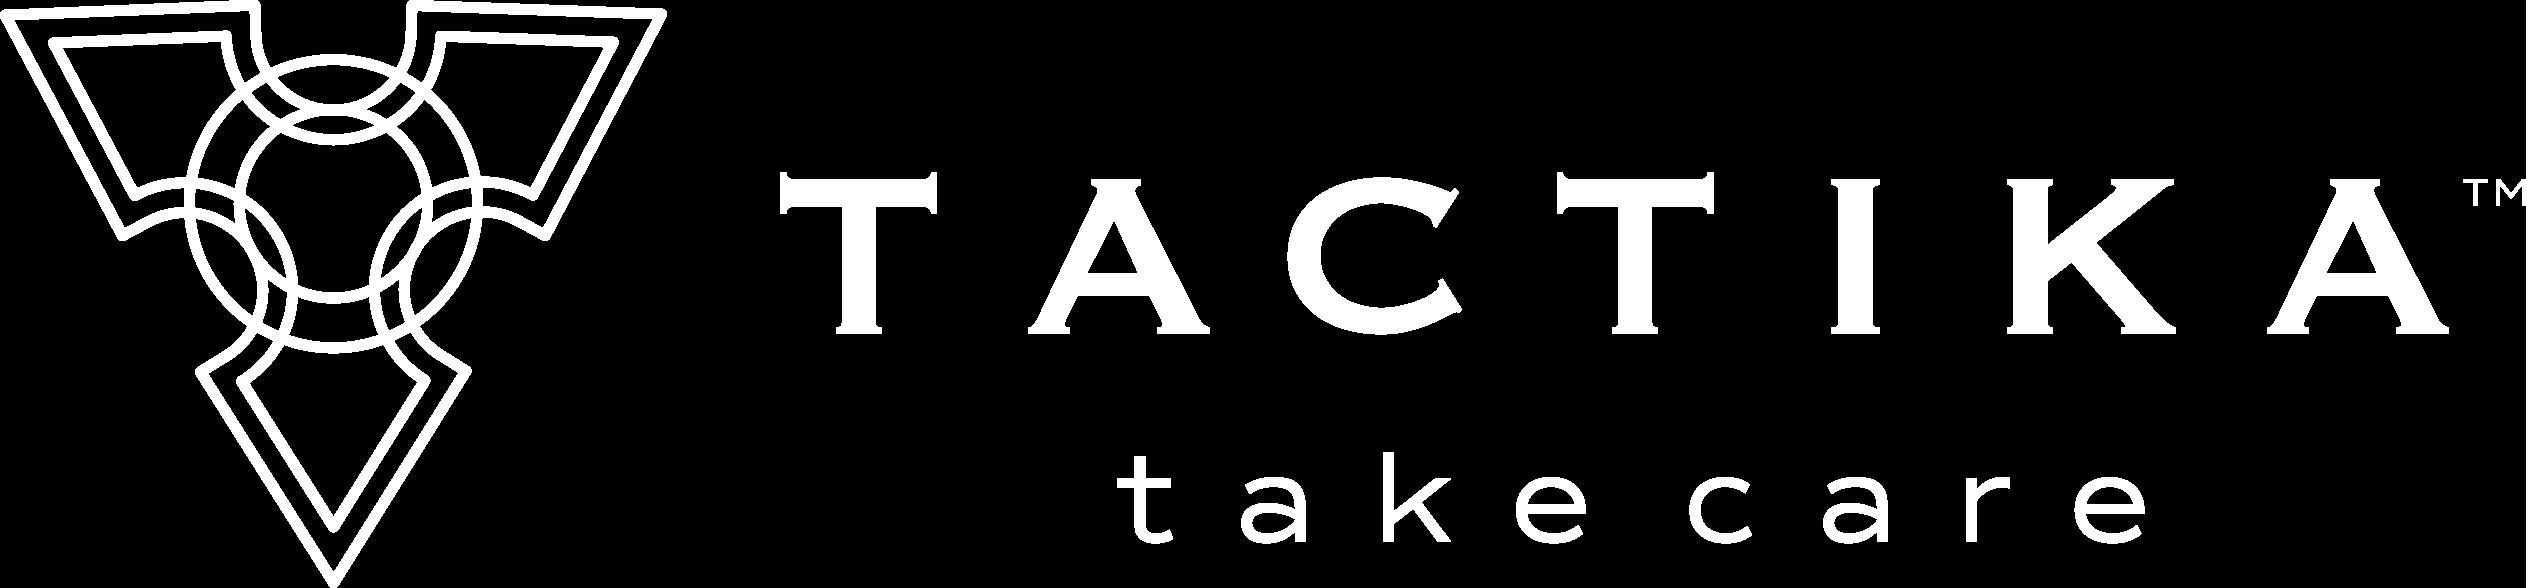 TACTIKA_LOGO